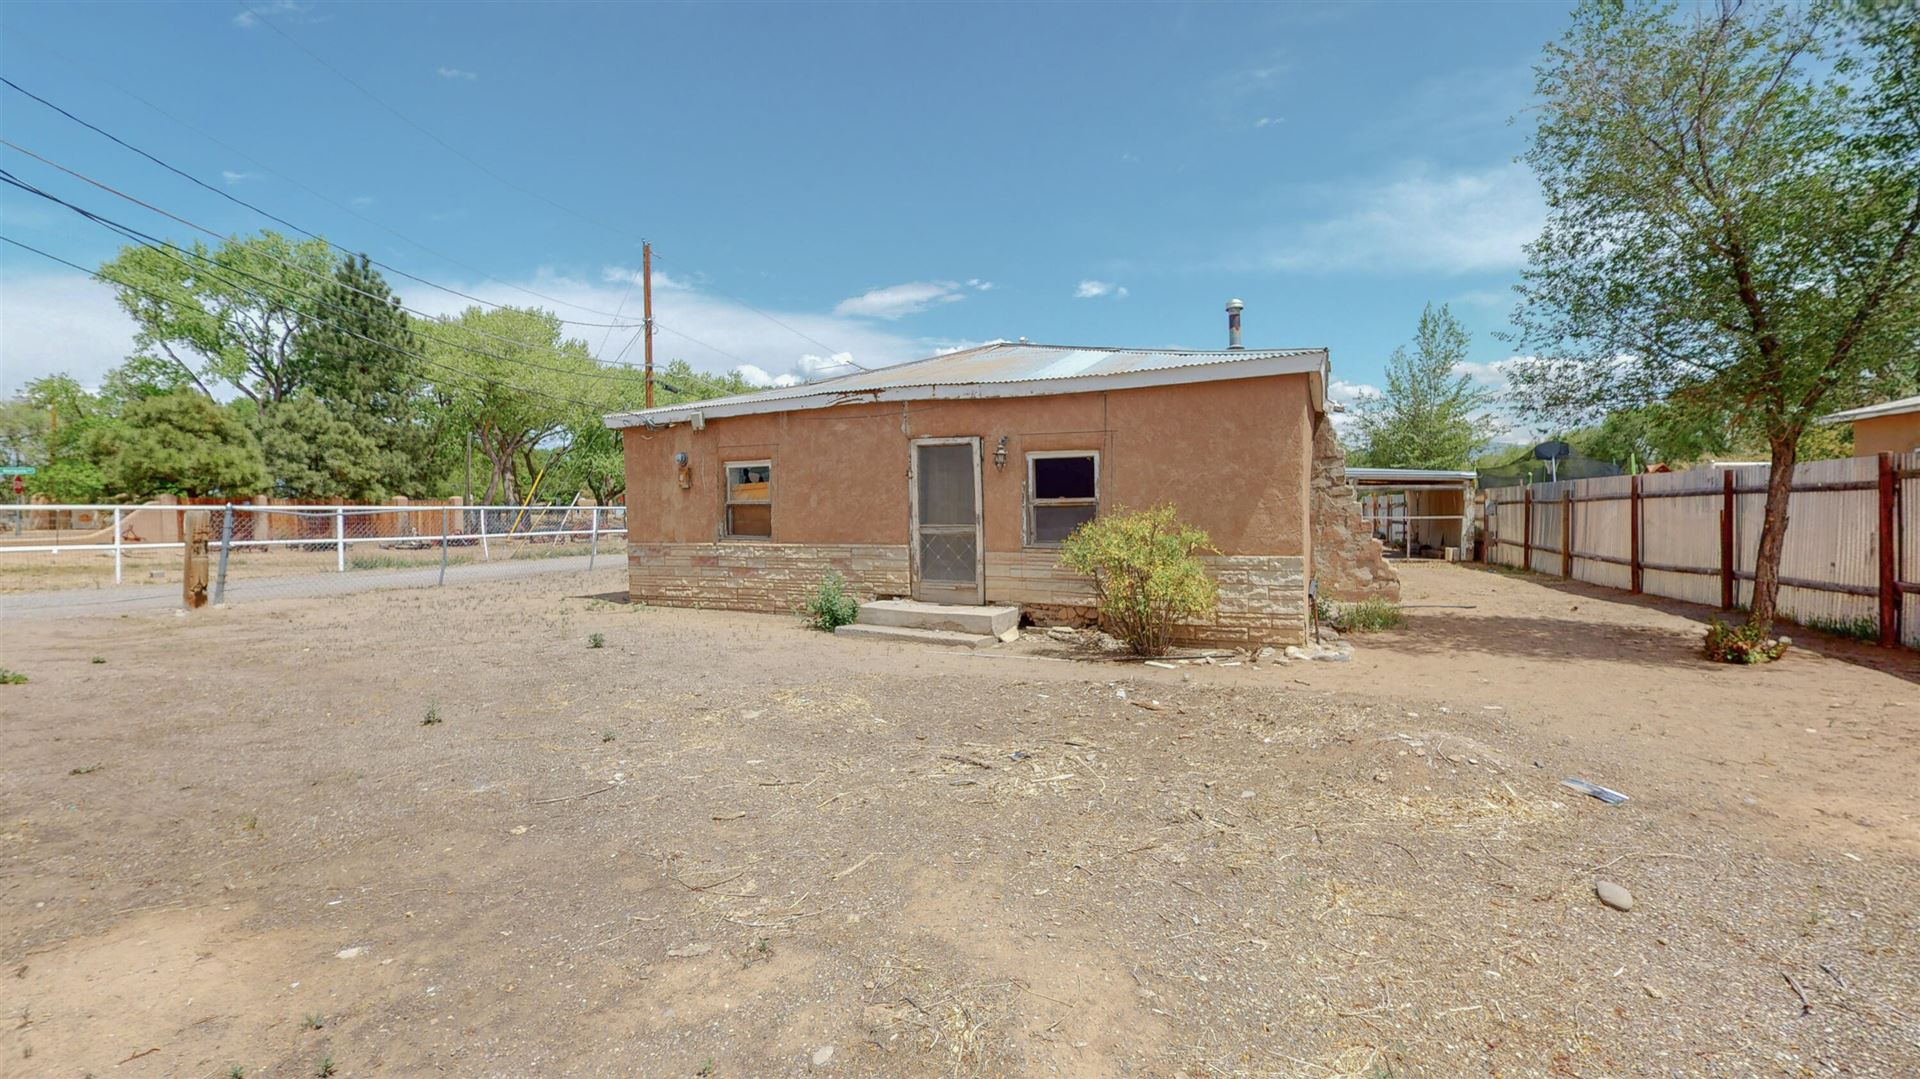 Photo of 2 SANCHEZ Road, Corrales, NM 87048 (MLS # 991227)